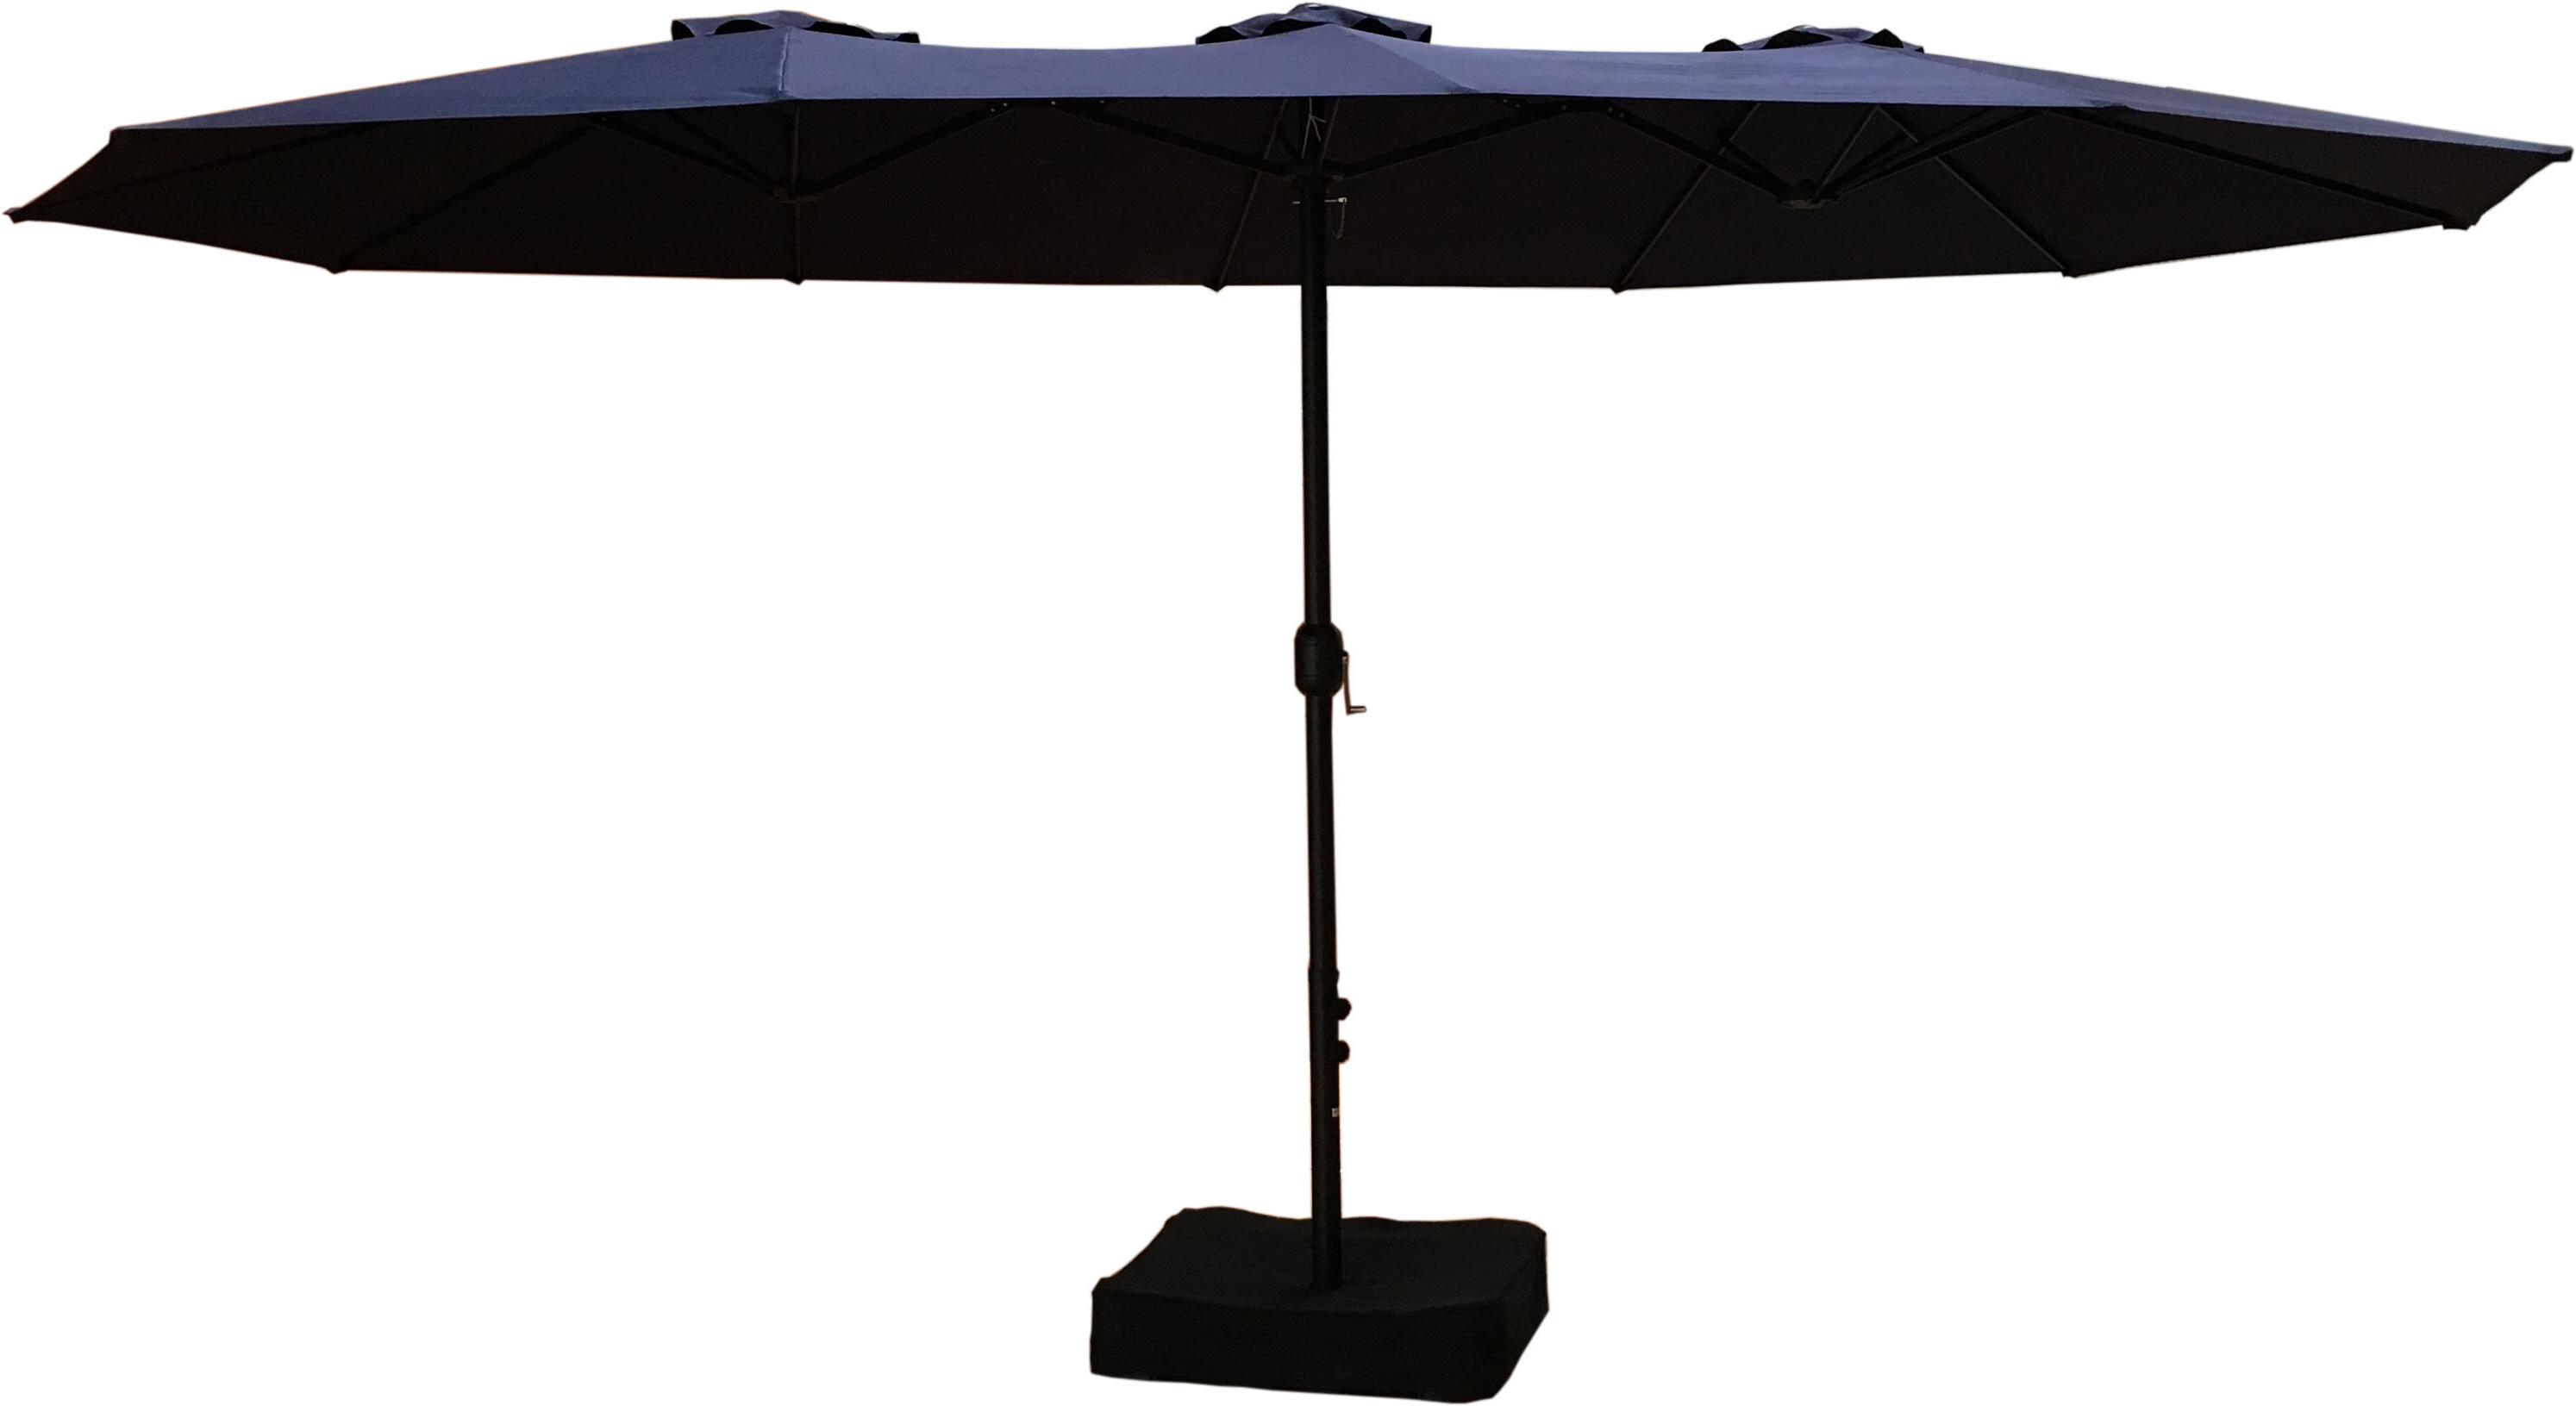 Cannock Market Umbrellas Intended For Famous Keane 15' Market Umbrella (View 7 of 20)